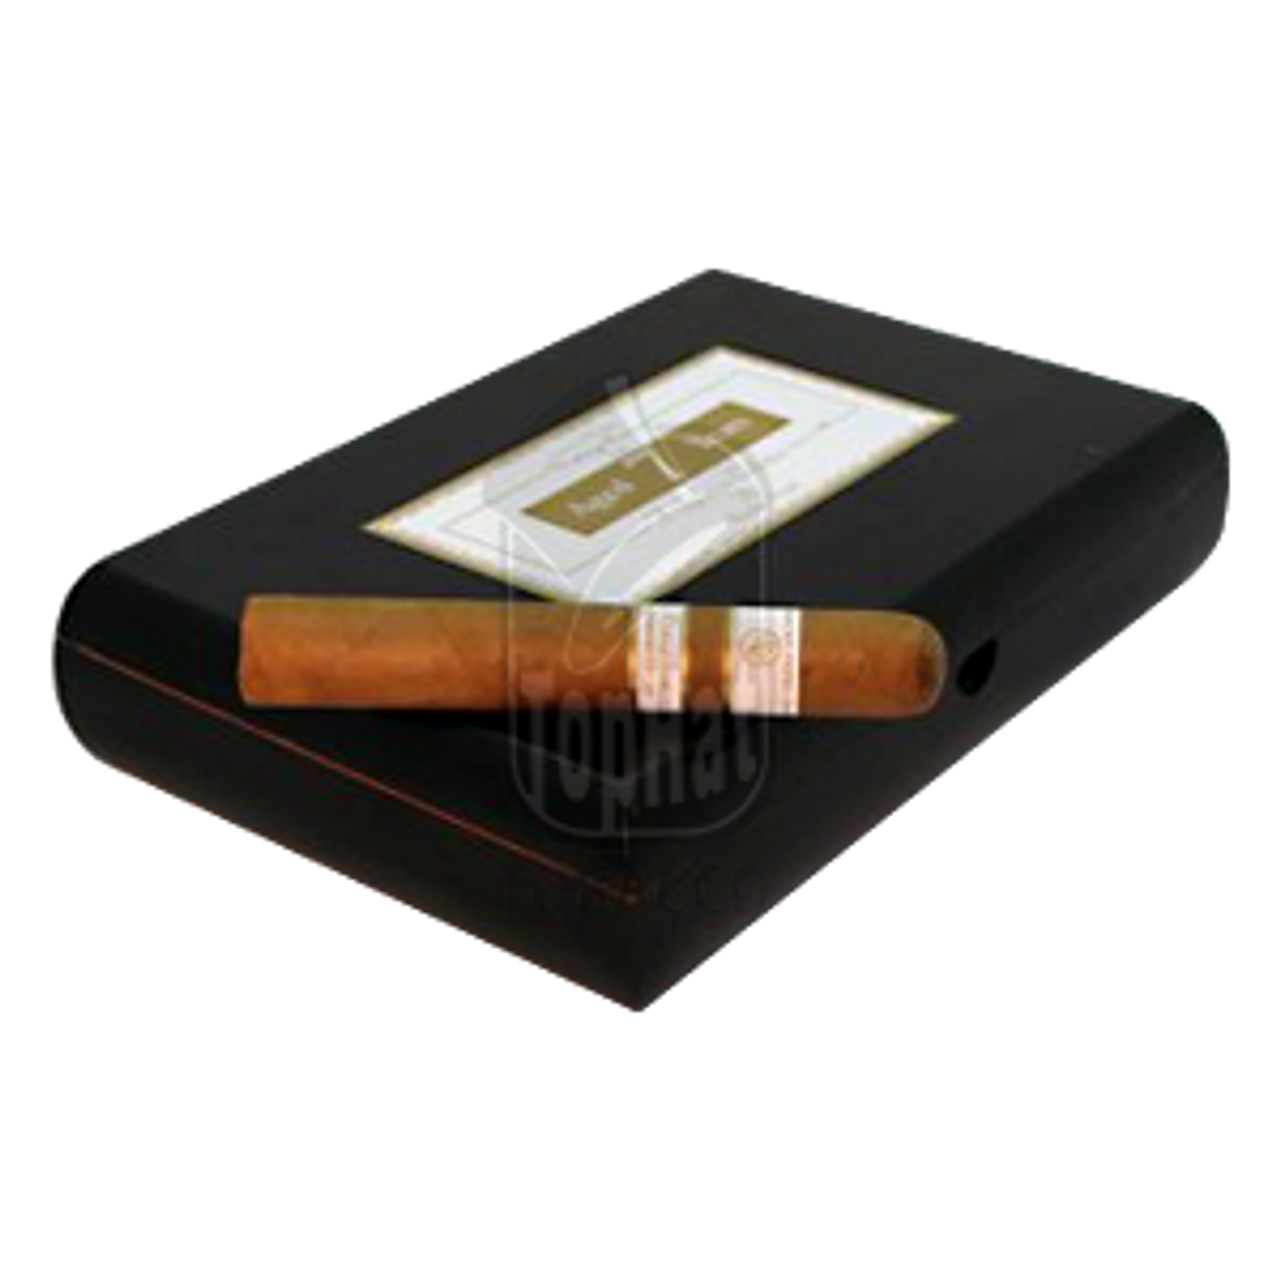 Rocky Patel Vintage 1999 Sixty Cigars - 6 x 60 (Box of 20)